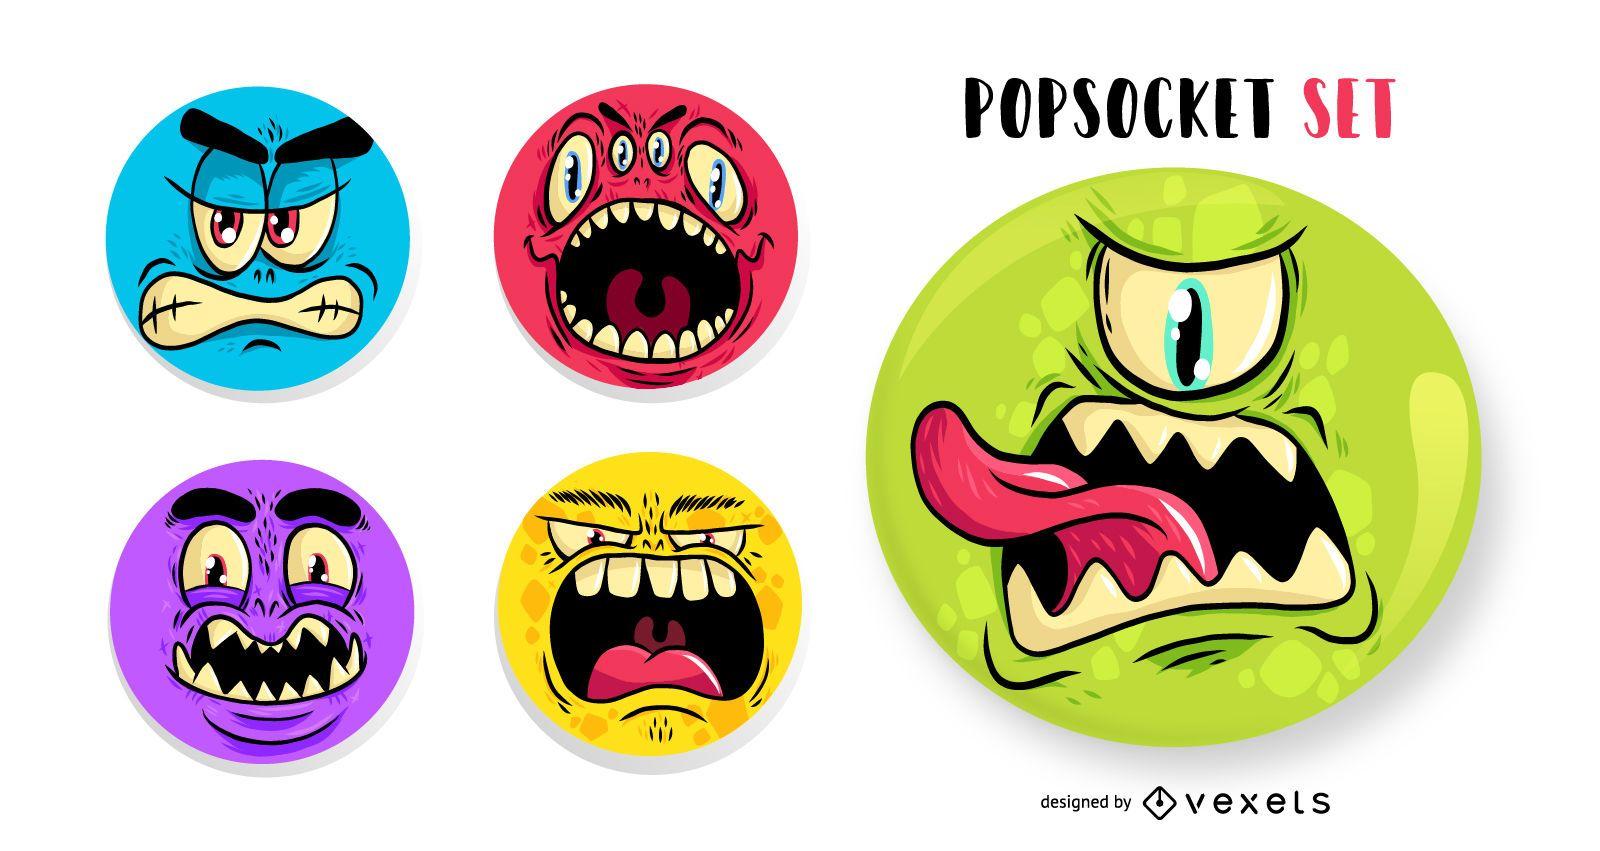 Monster Gesicht Popsockets gesetzt